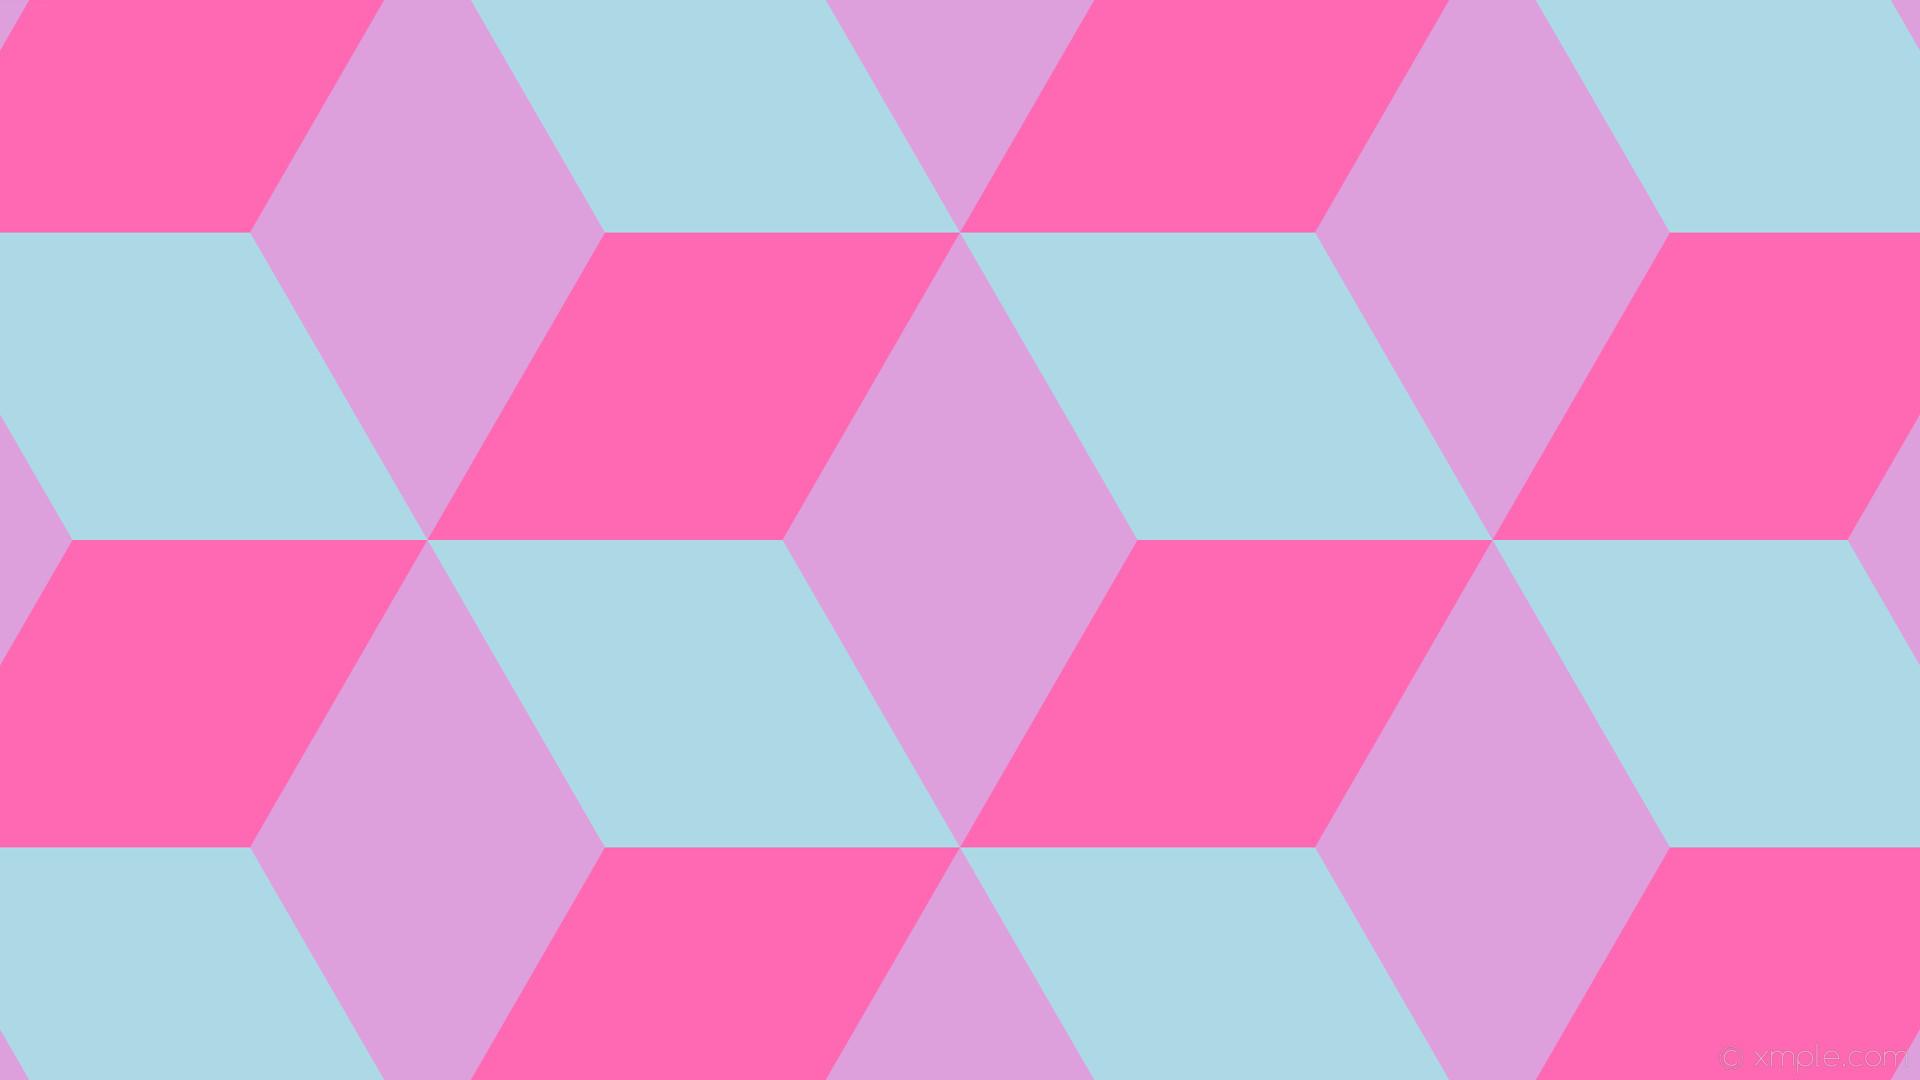 wallpaper pink purple blue 3d cubes plum hot pink light blue #dda0dd  #ff69b4 #